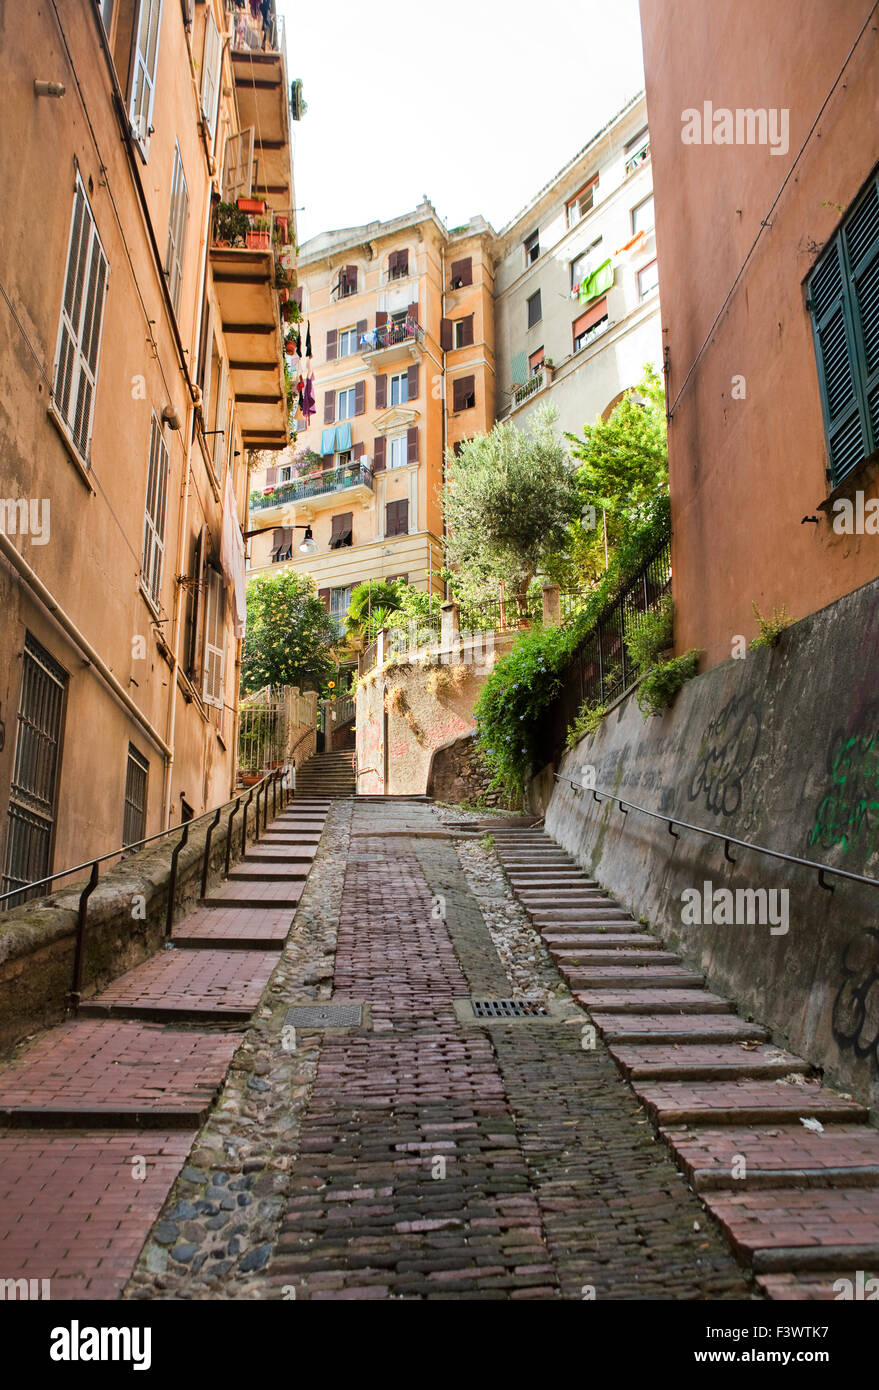 Streets in Genoa - Stock Image